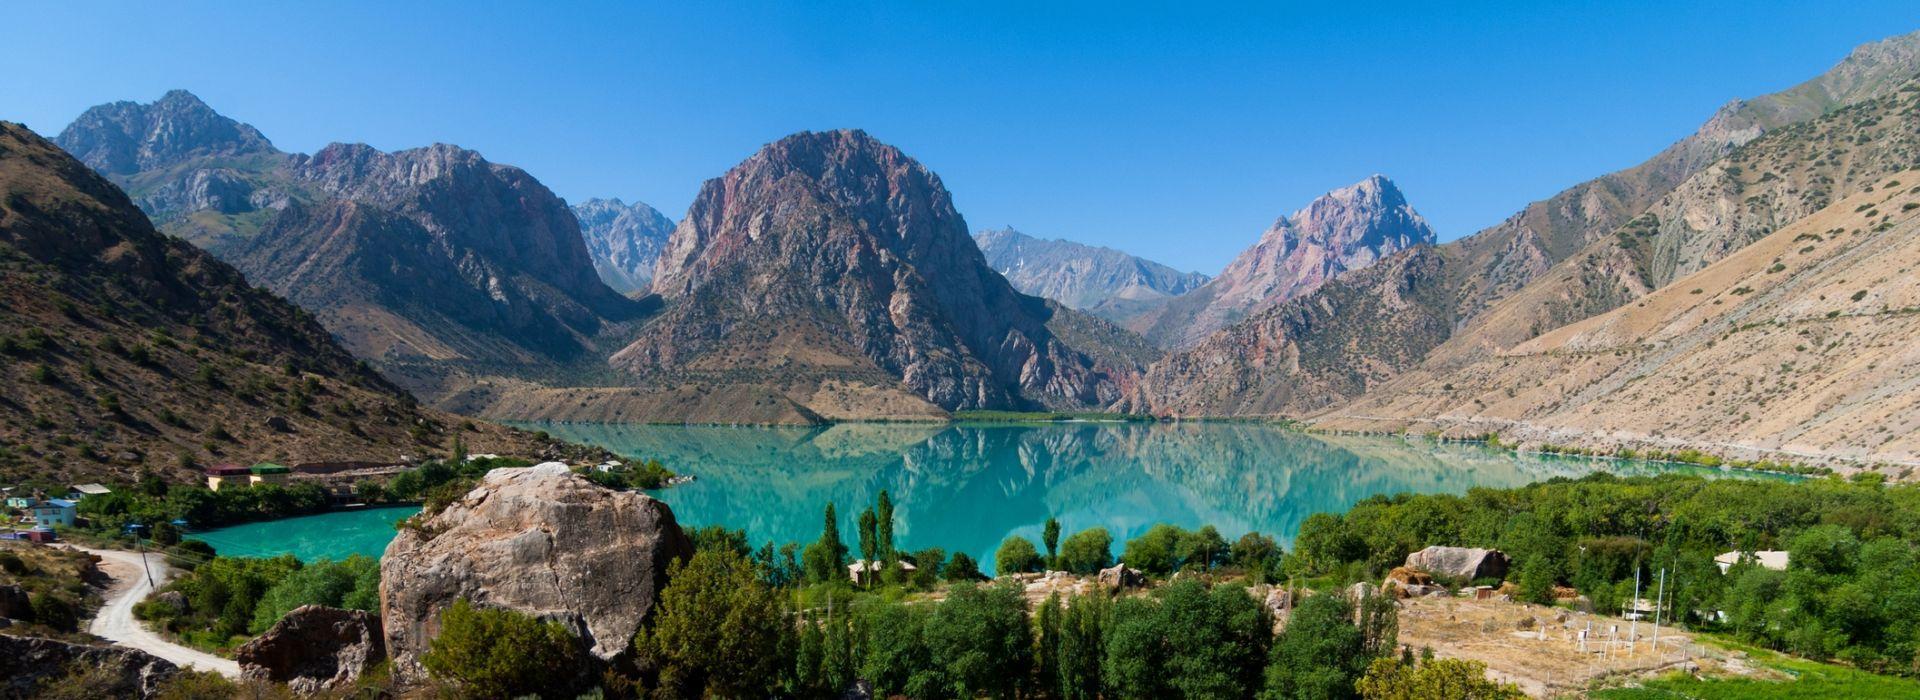 Tajikistan Tours and Trips to Tajikistan